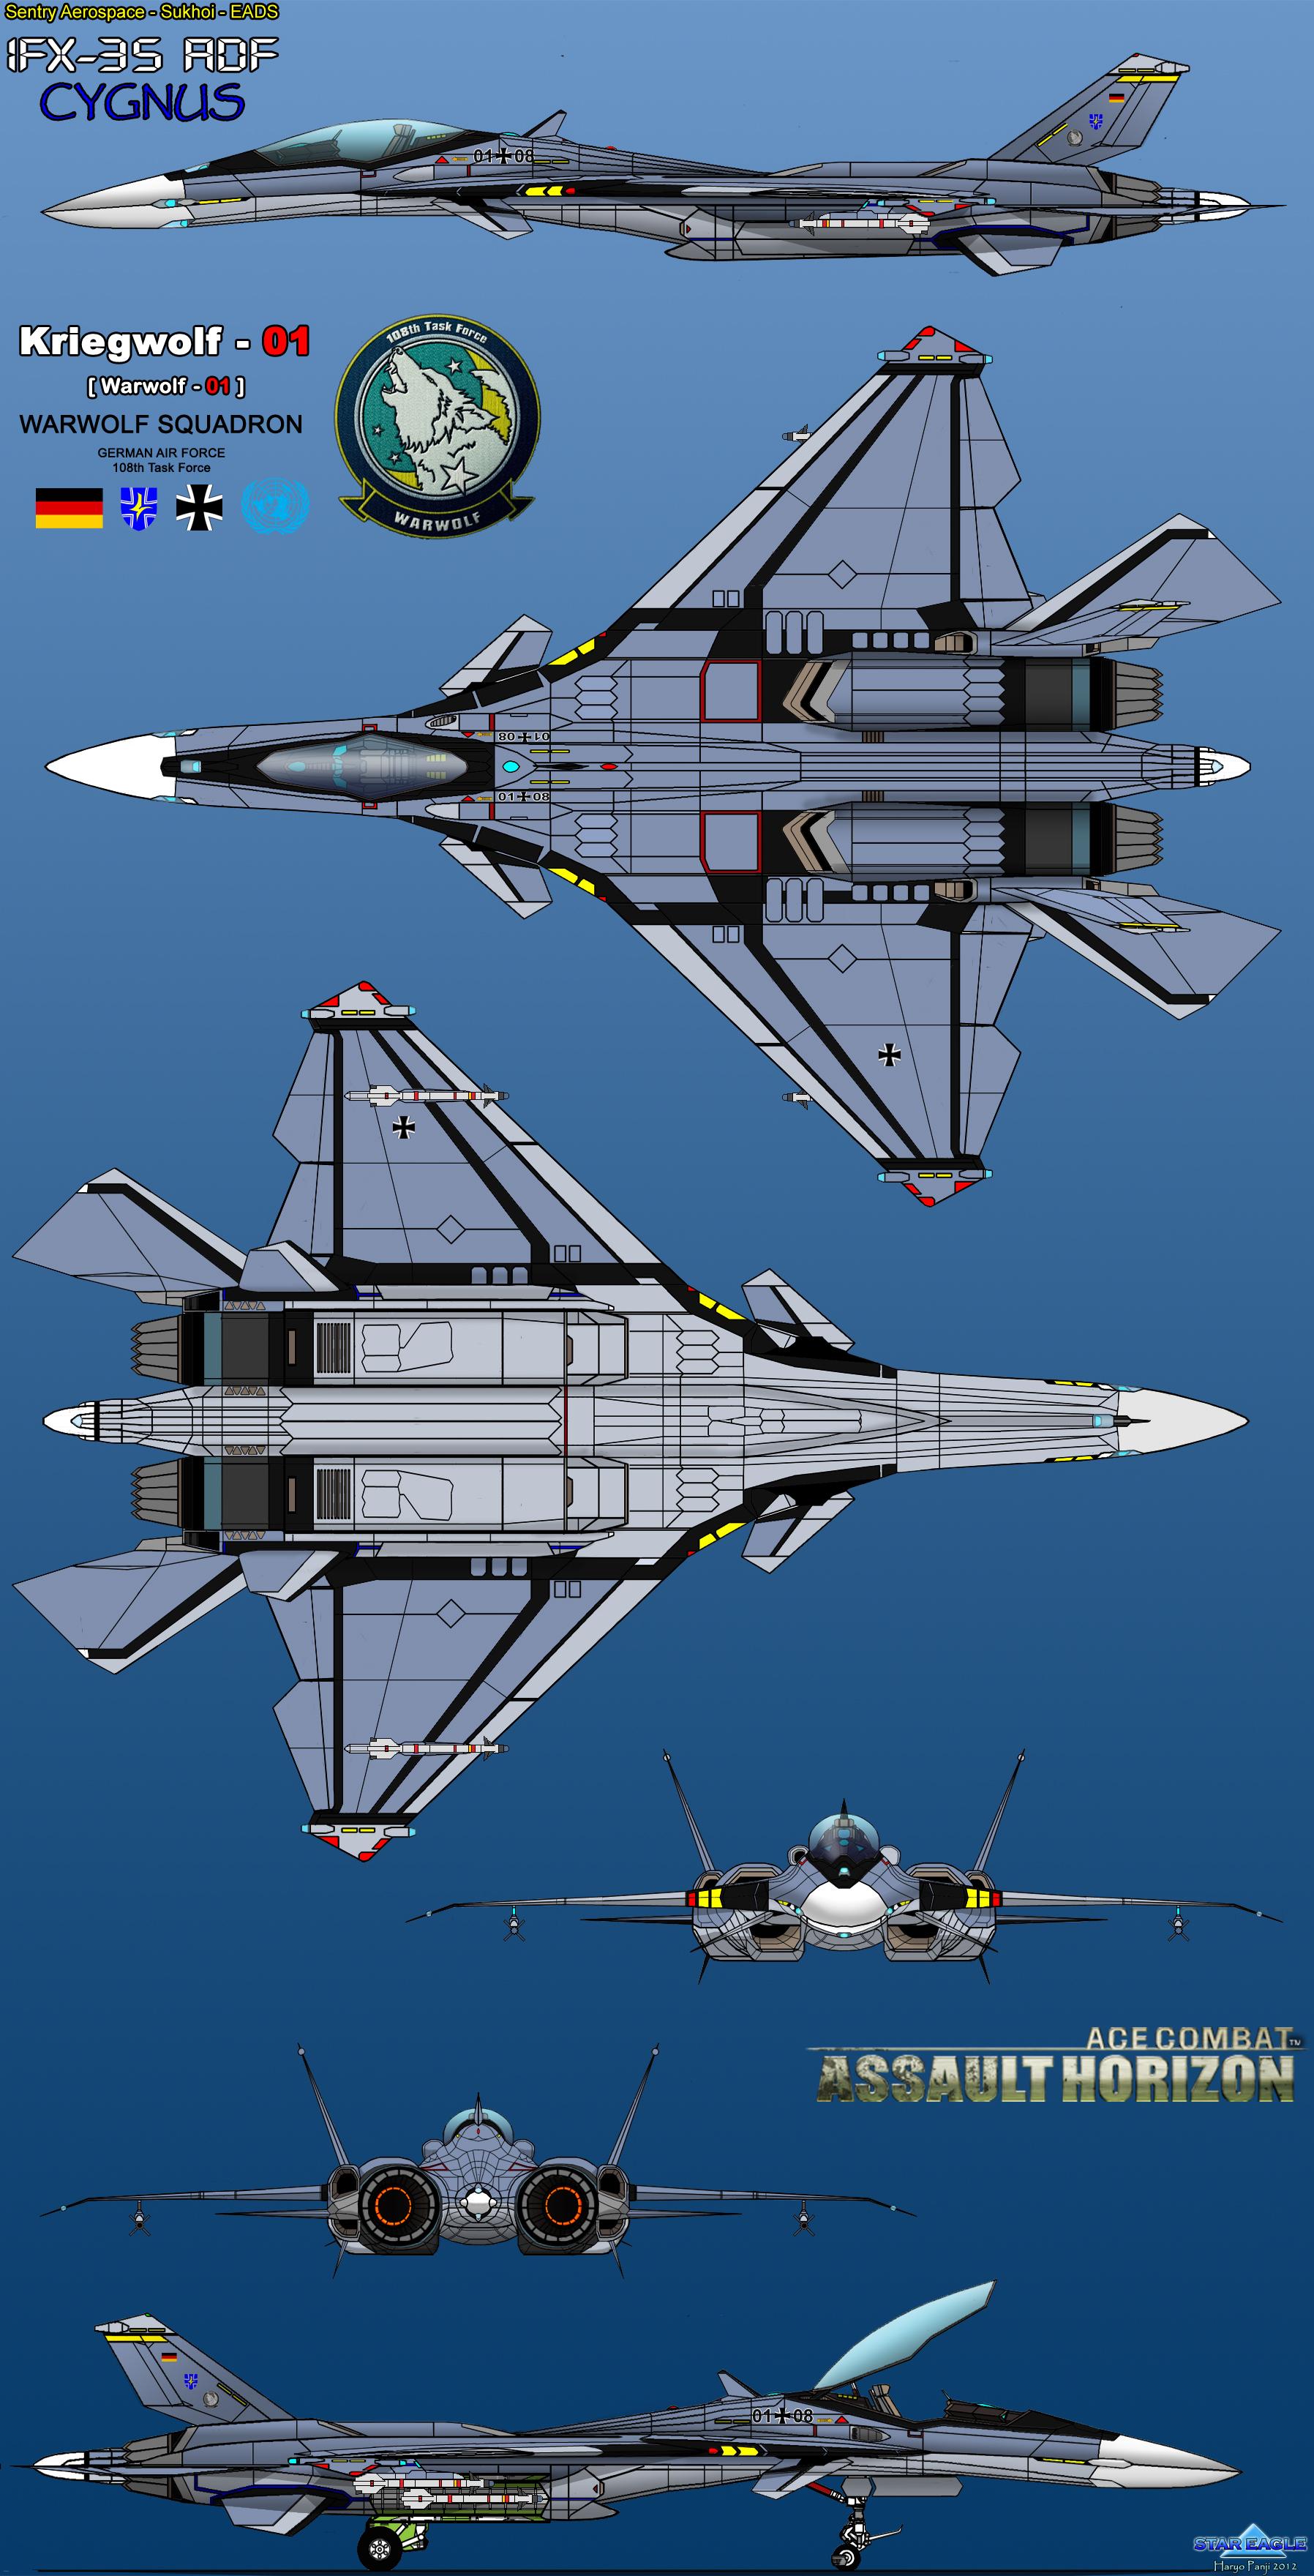 IFX-35 ADF Cygnus - Kriegwolf-One by haryopanji